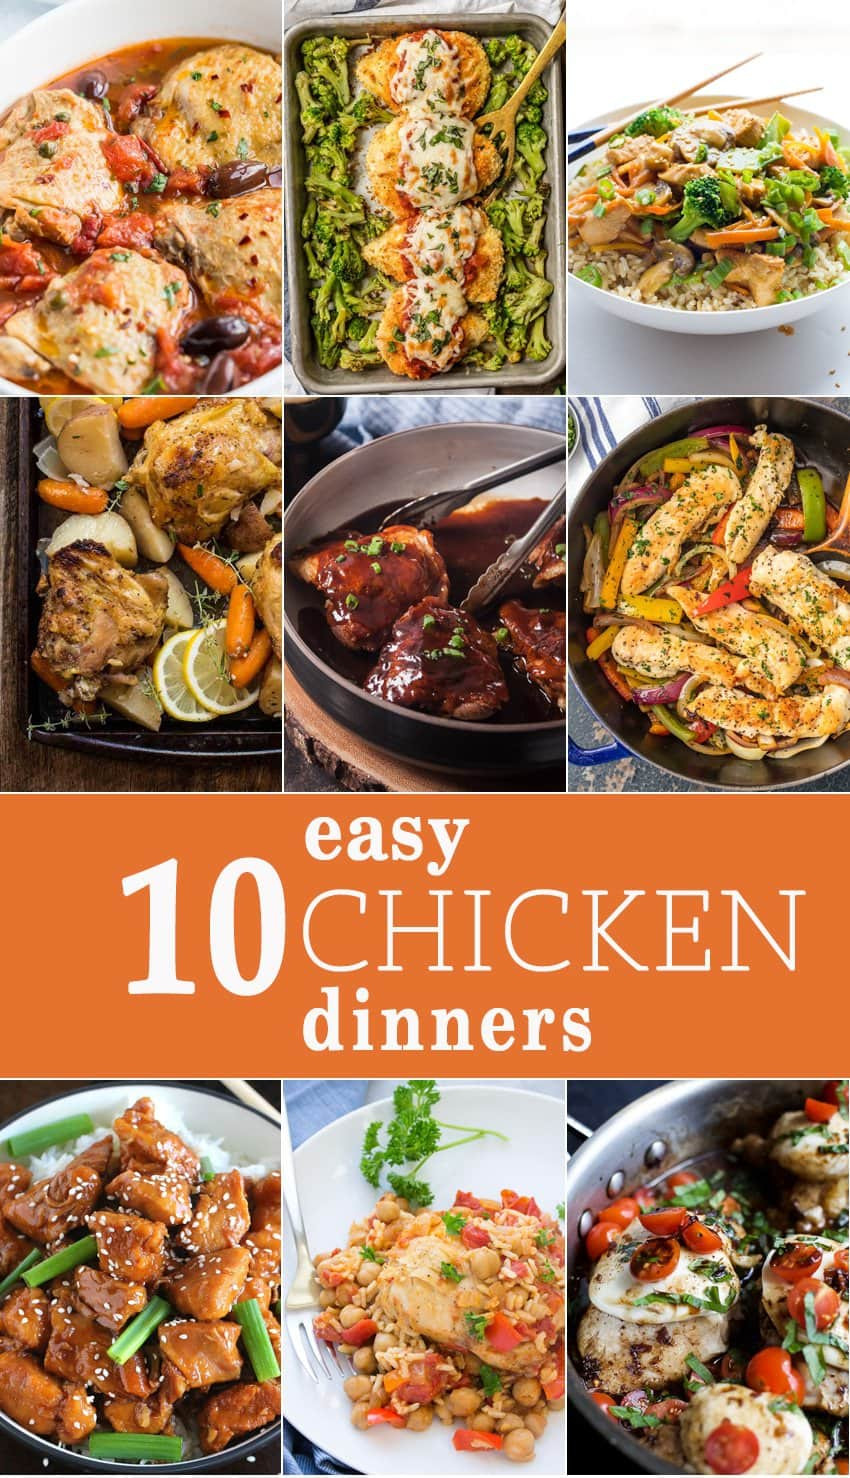 Easy Chicken Dinners  10 Easy Chicken Dinners The Cookie Rookie